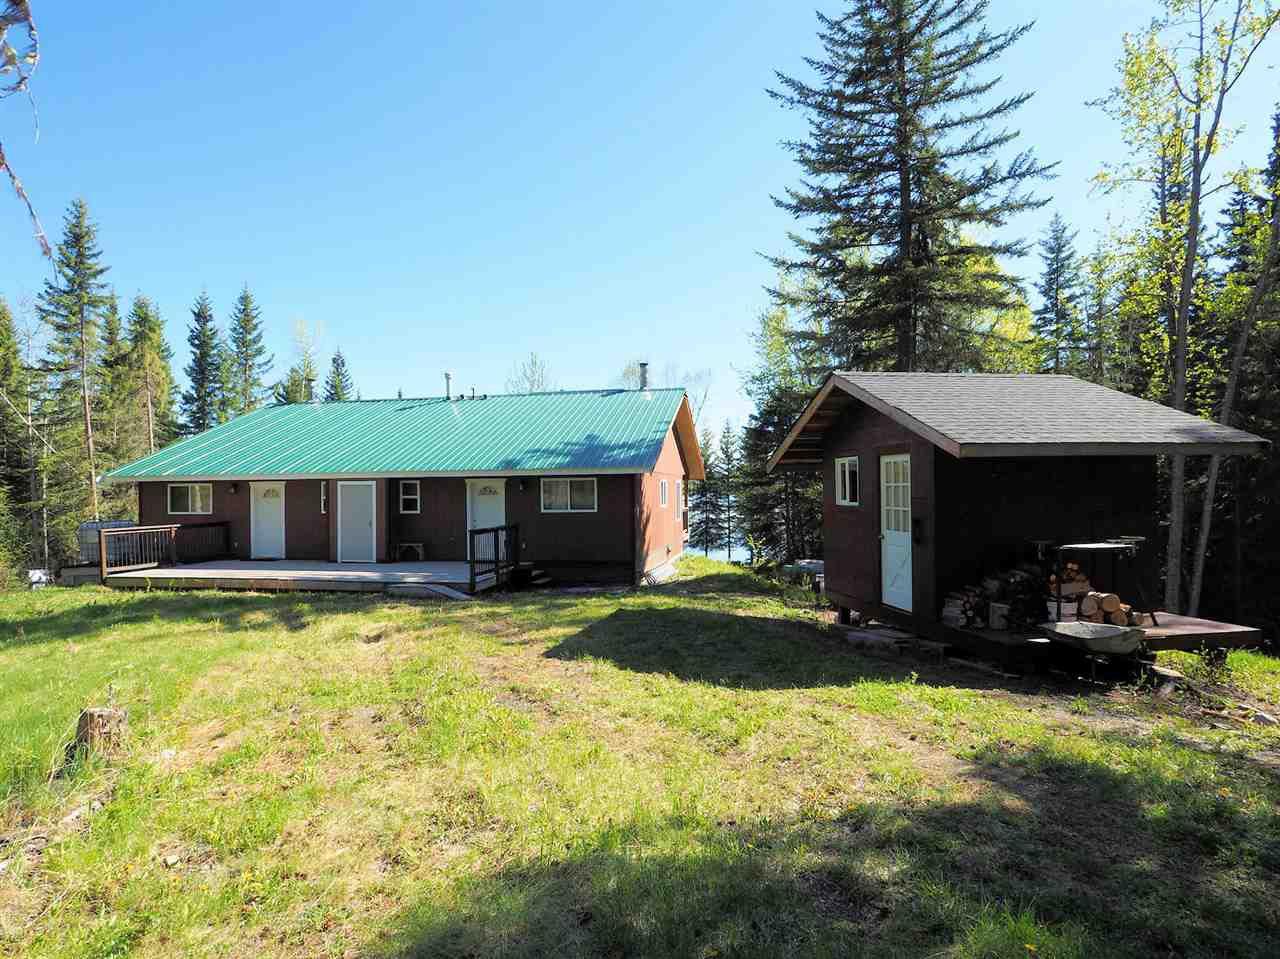 Photo 2: Photos: 8222 CENTENNIAL Road in Bridge Lake: Bridge Lake/Sheridan Lake House for sale (100 Mile House (Zone 10))  : MLS®# R2457362